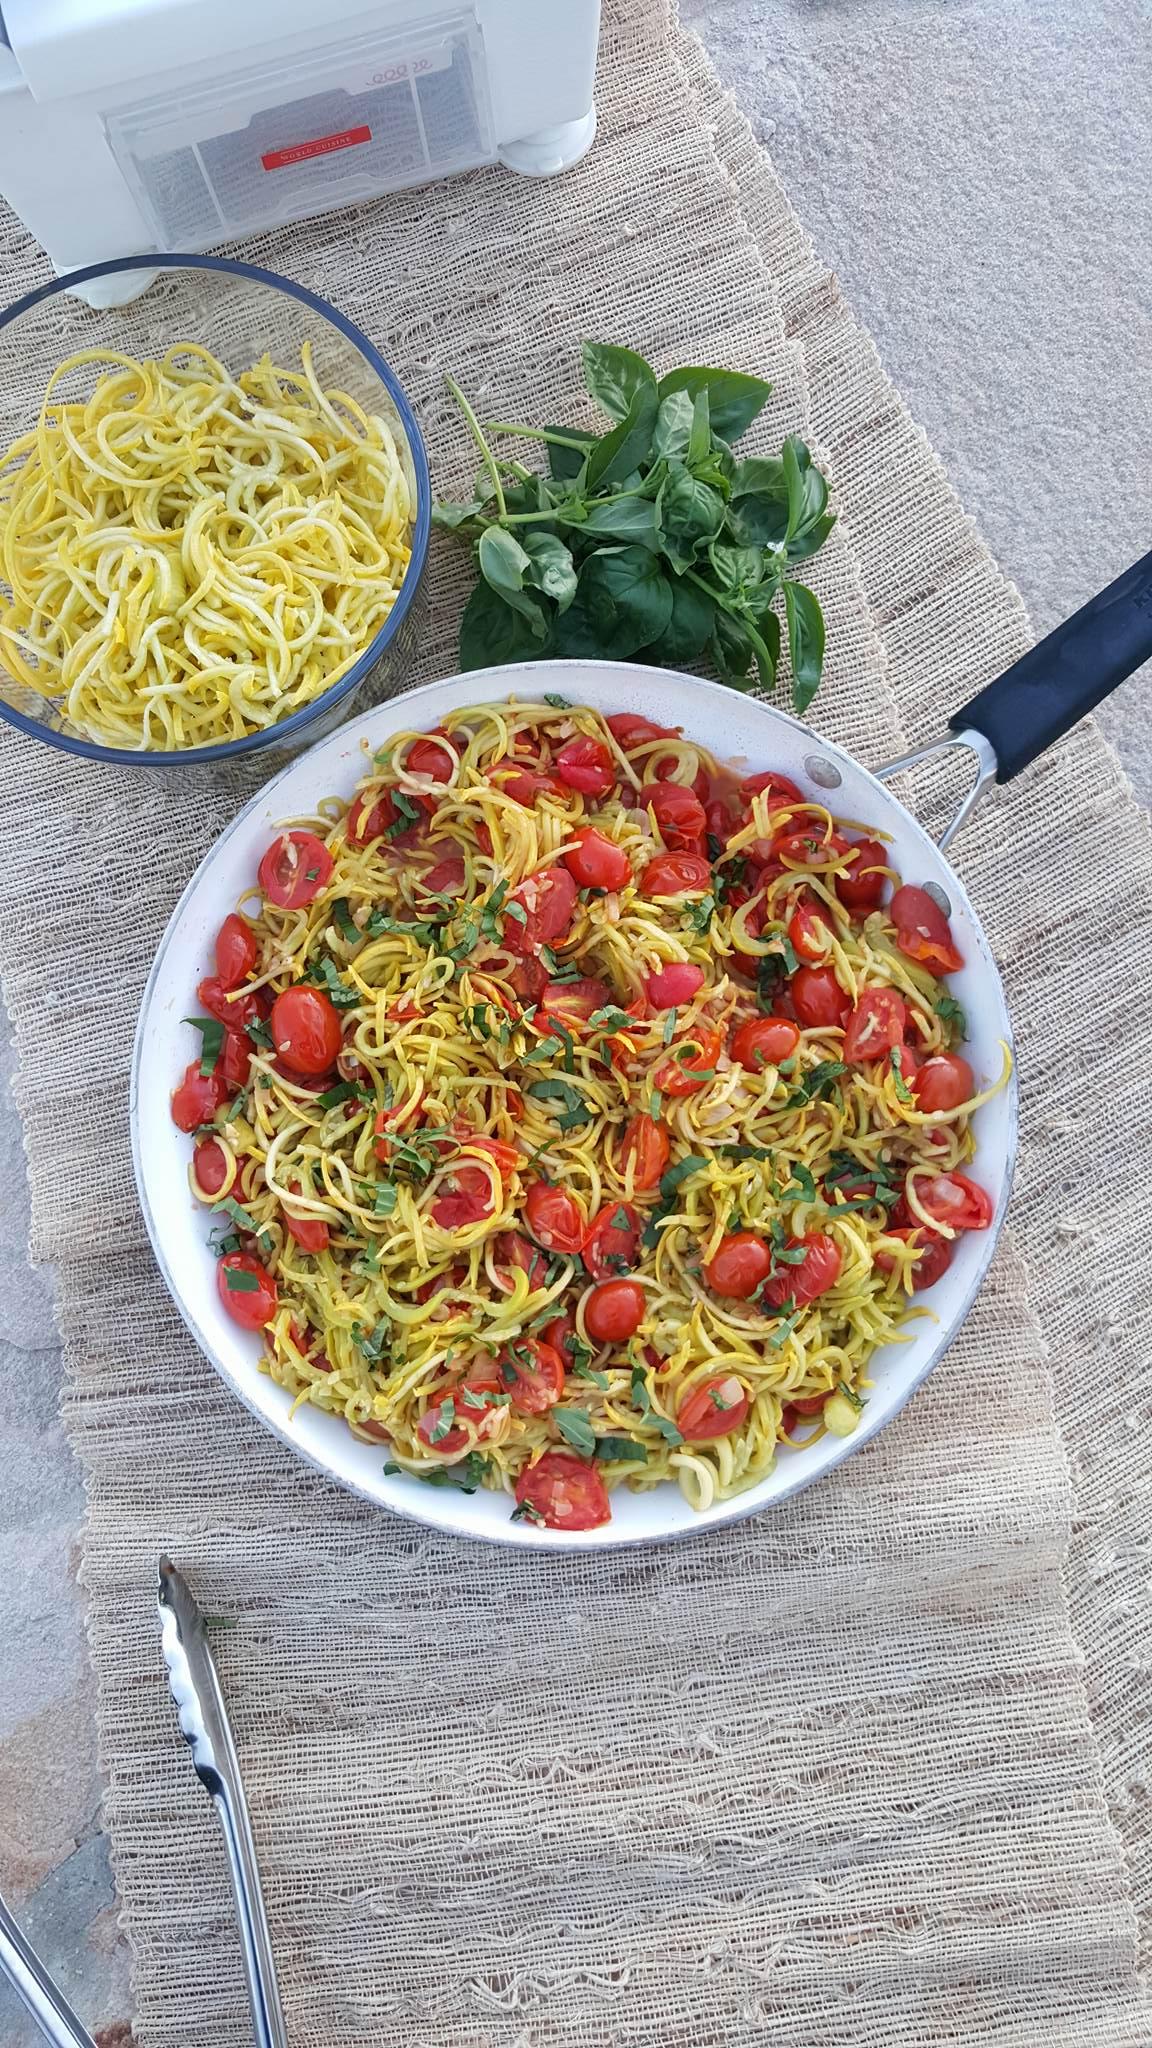 Yellow Summer Squash 'Spaghetti' with Roasted Tomato Sauce Recipe